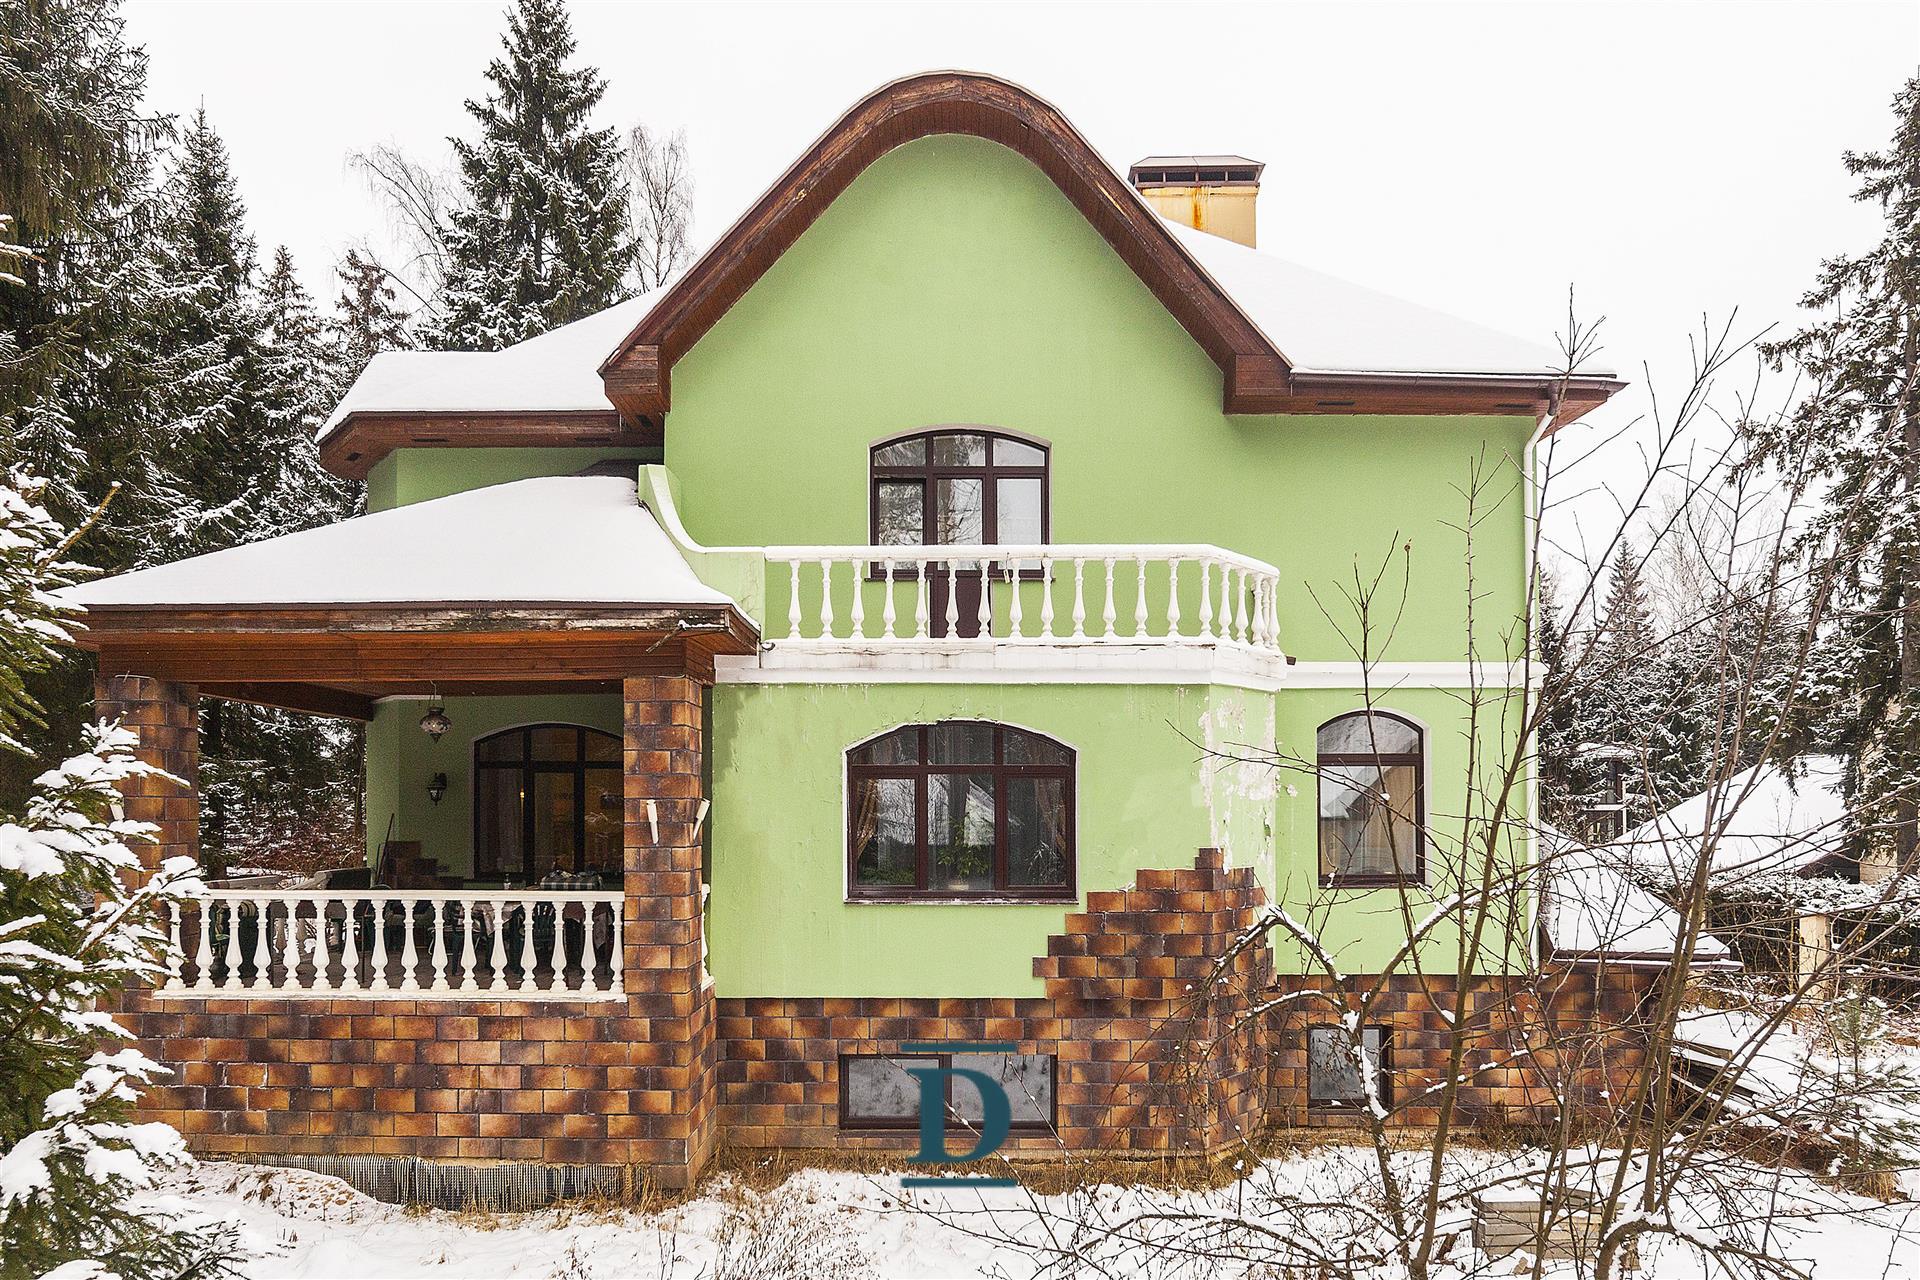 дом ID-226 в коттеджном посёлке Шервуд